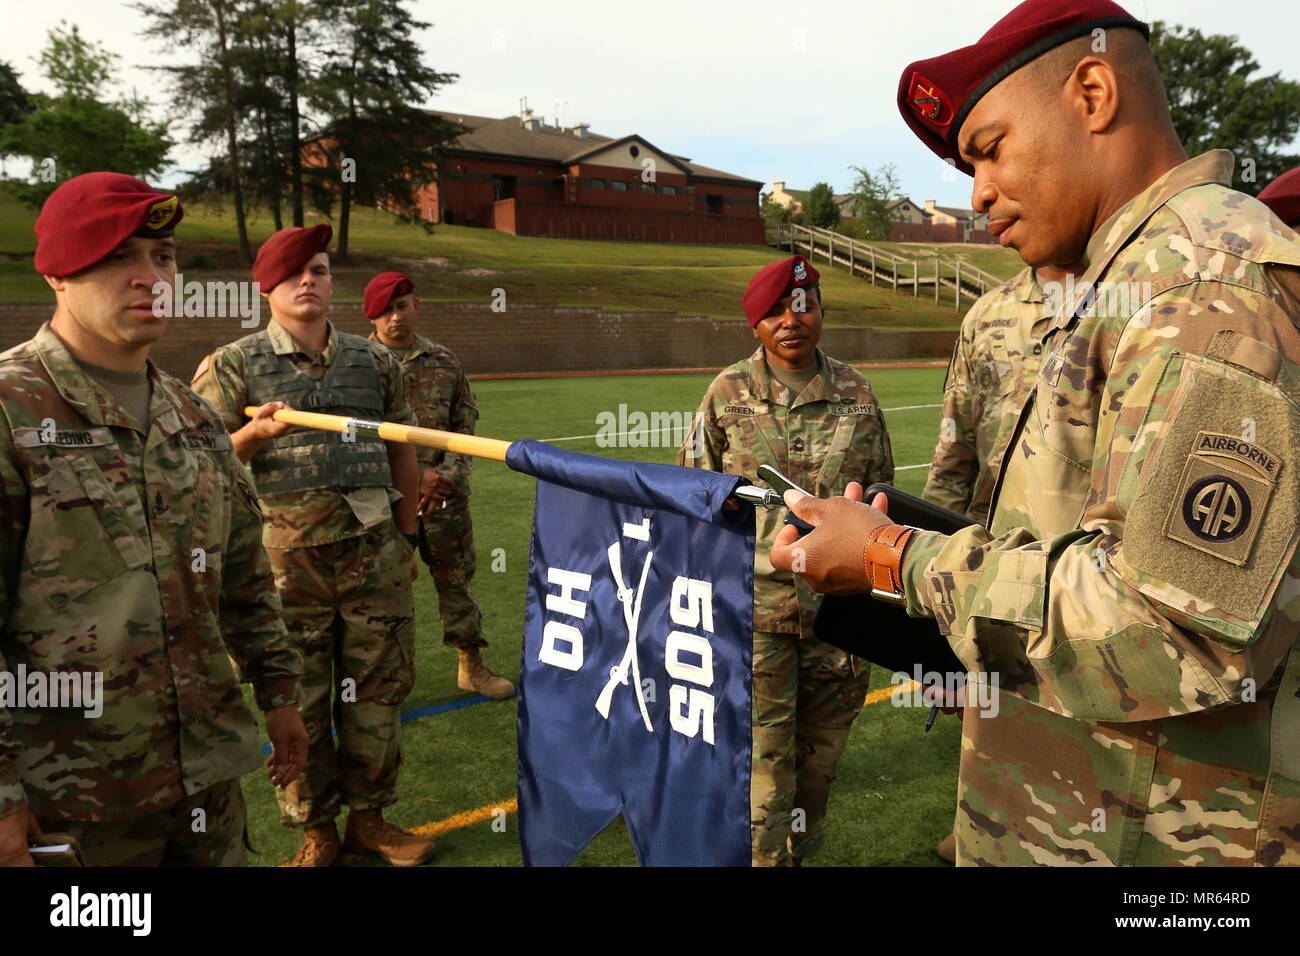 1st Guards Airborne Division